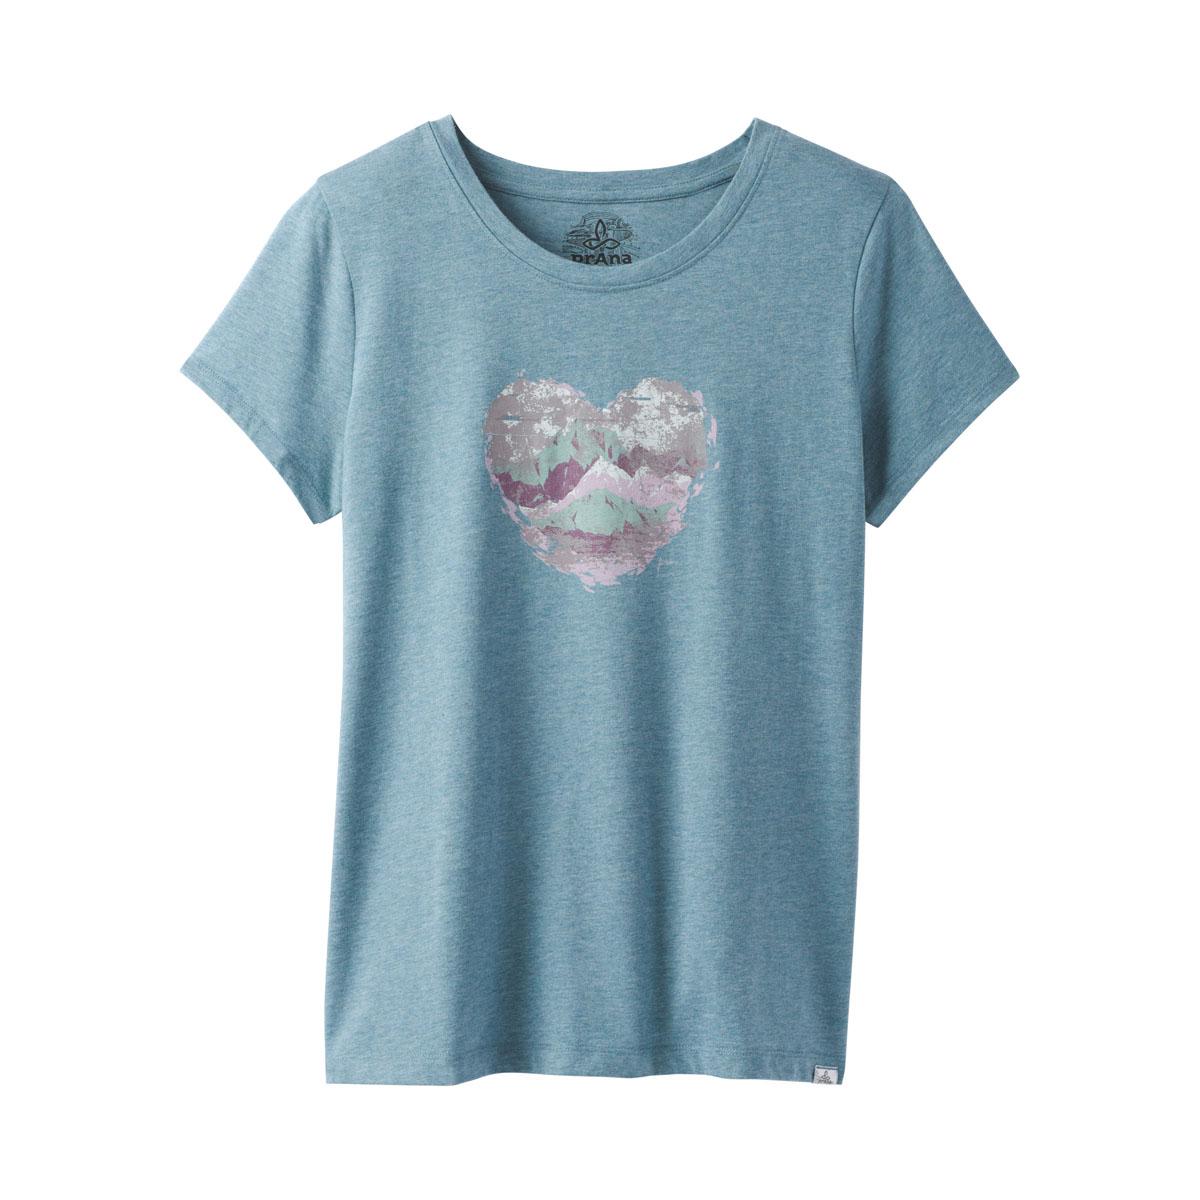 prana prana climbing tee women t shirts shirts tops